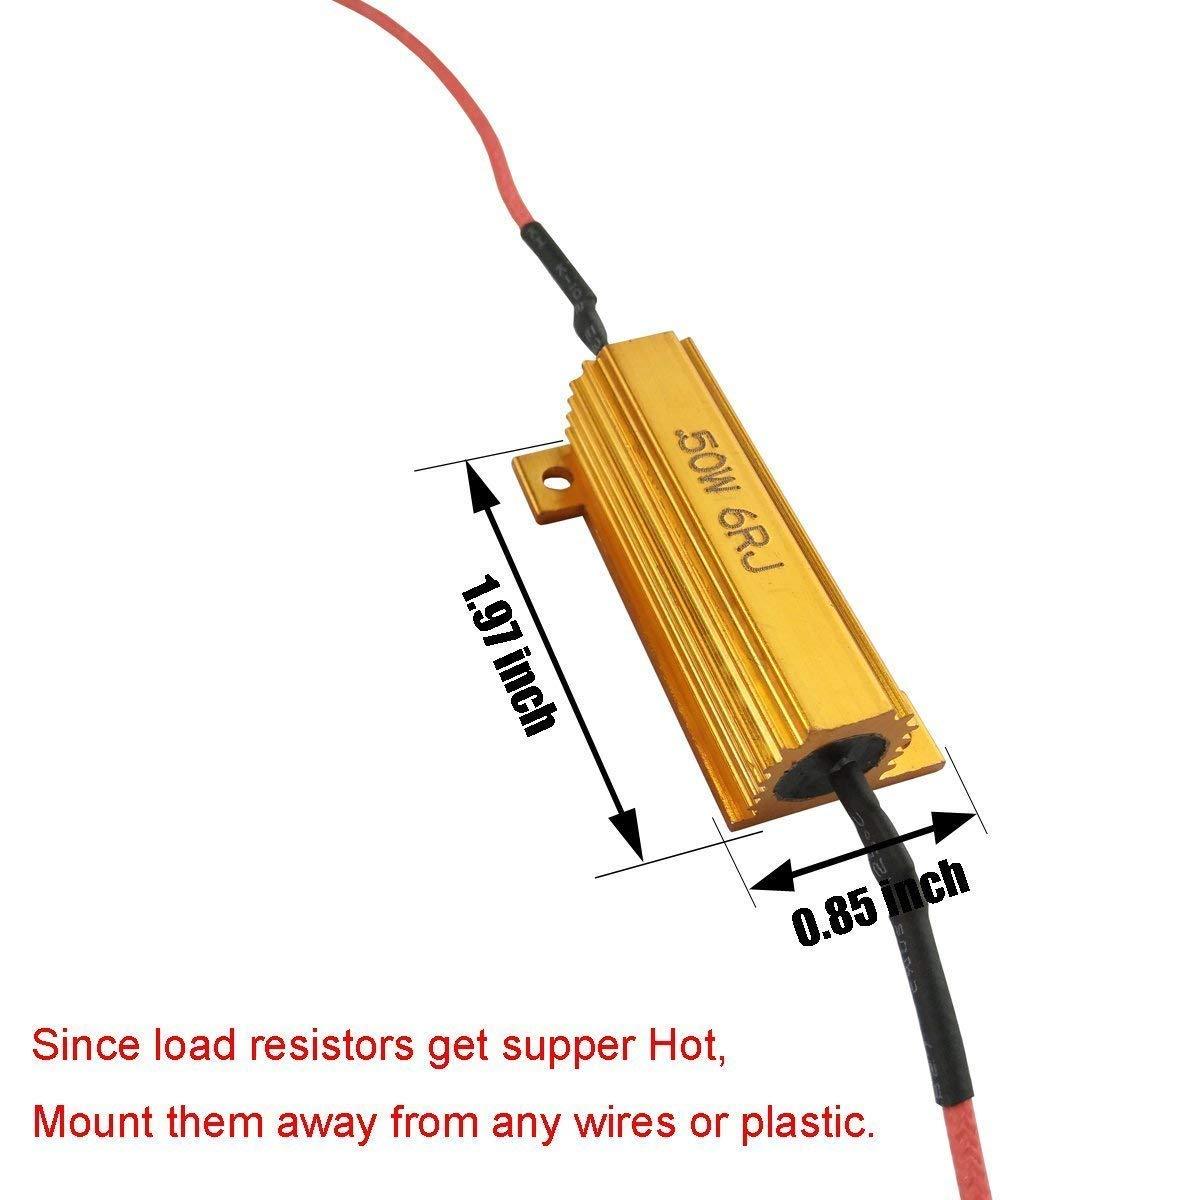 Turn Signal Bulbs iBrightstar 50W 6ohm Load Resistors Fix LED Bulb ...